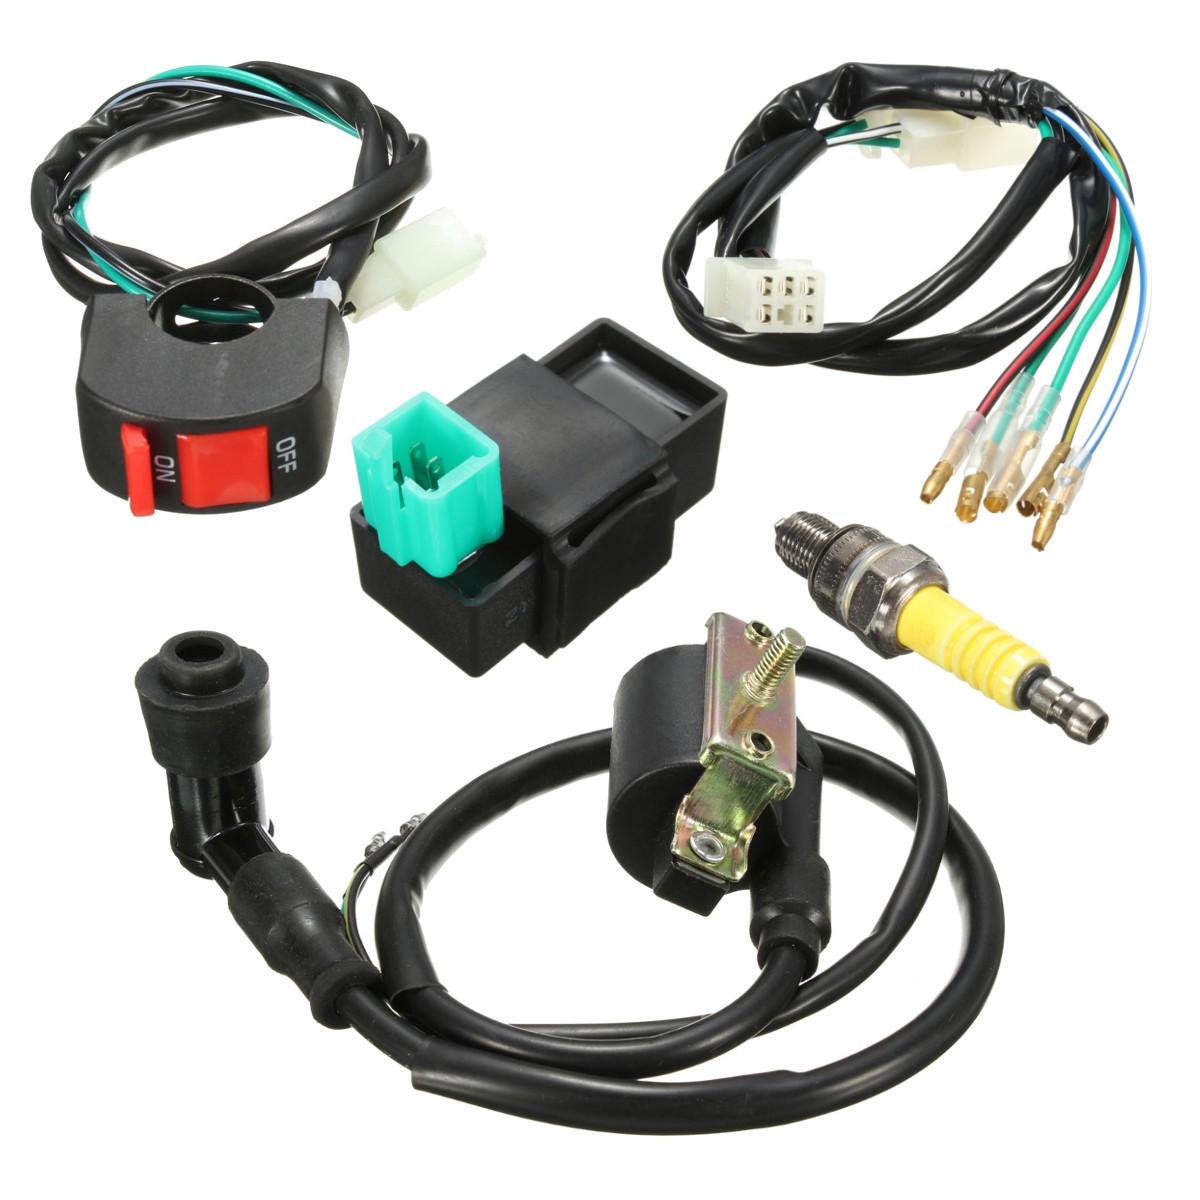 hight resolution of wiring loom kill switch coil cdi spark plug kit for 110cc 125cc 140cc pit bike cod